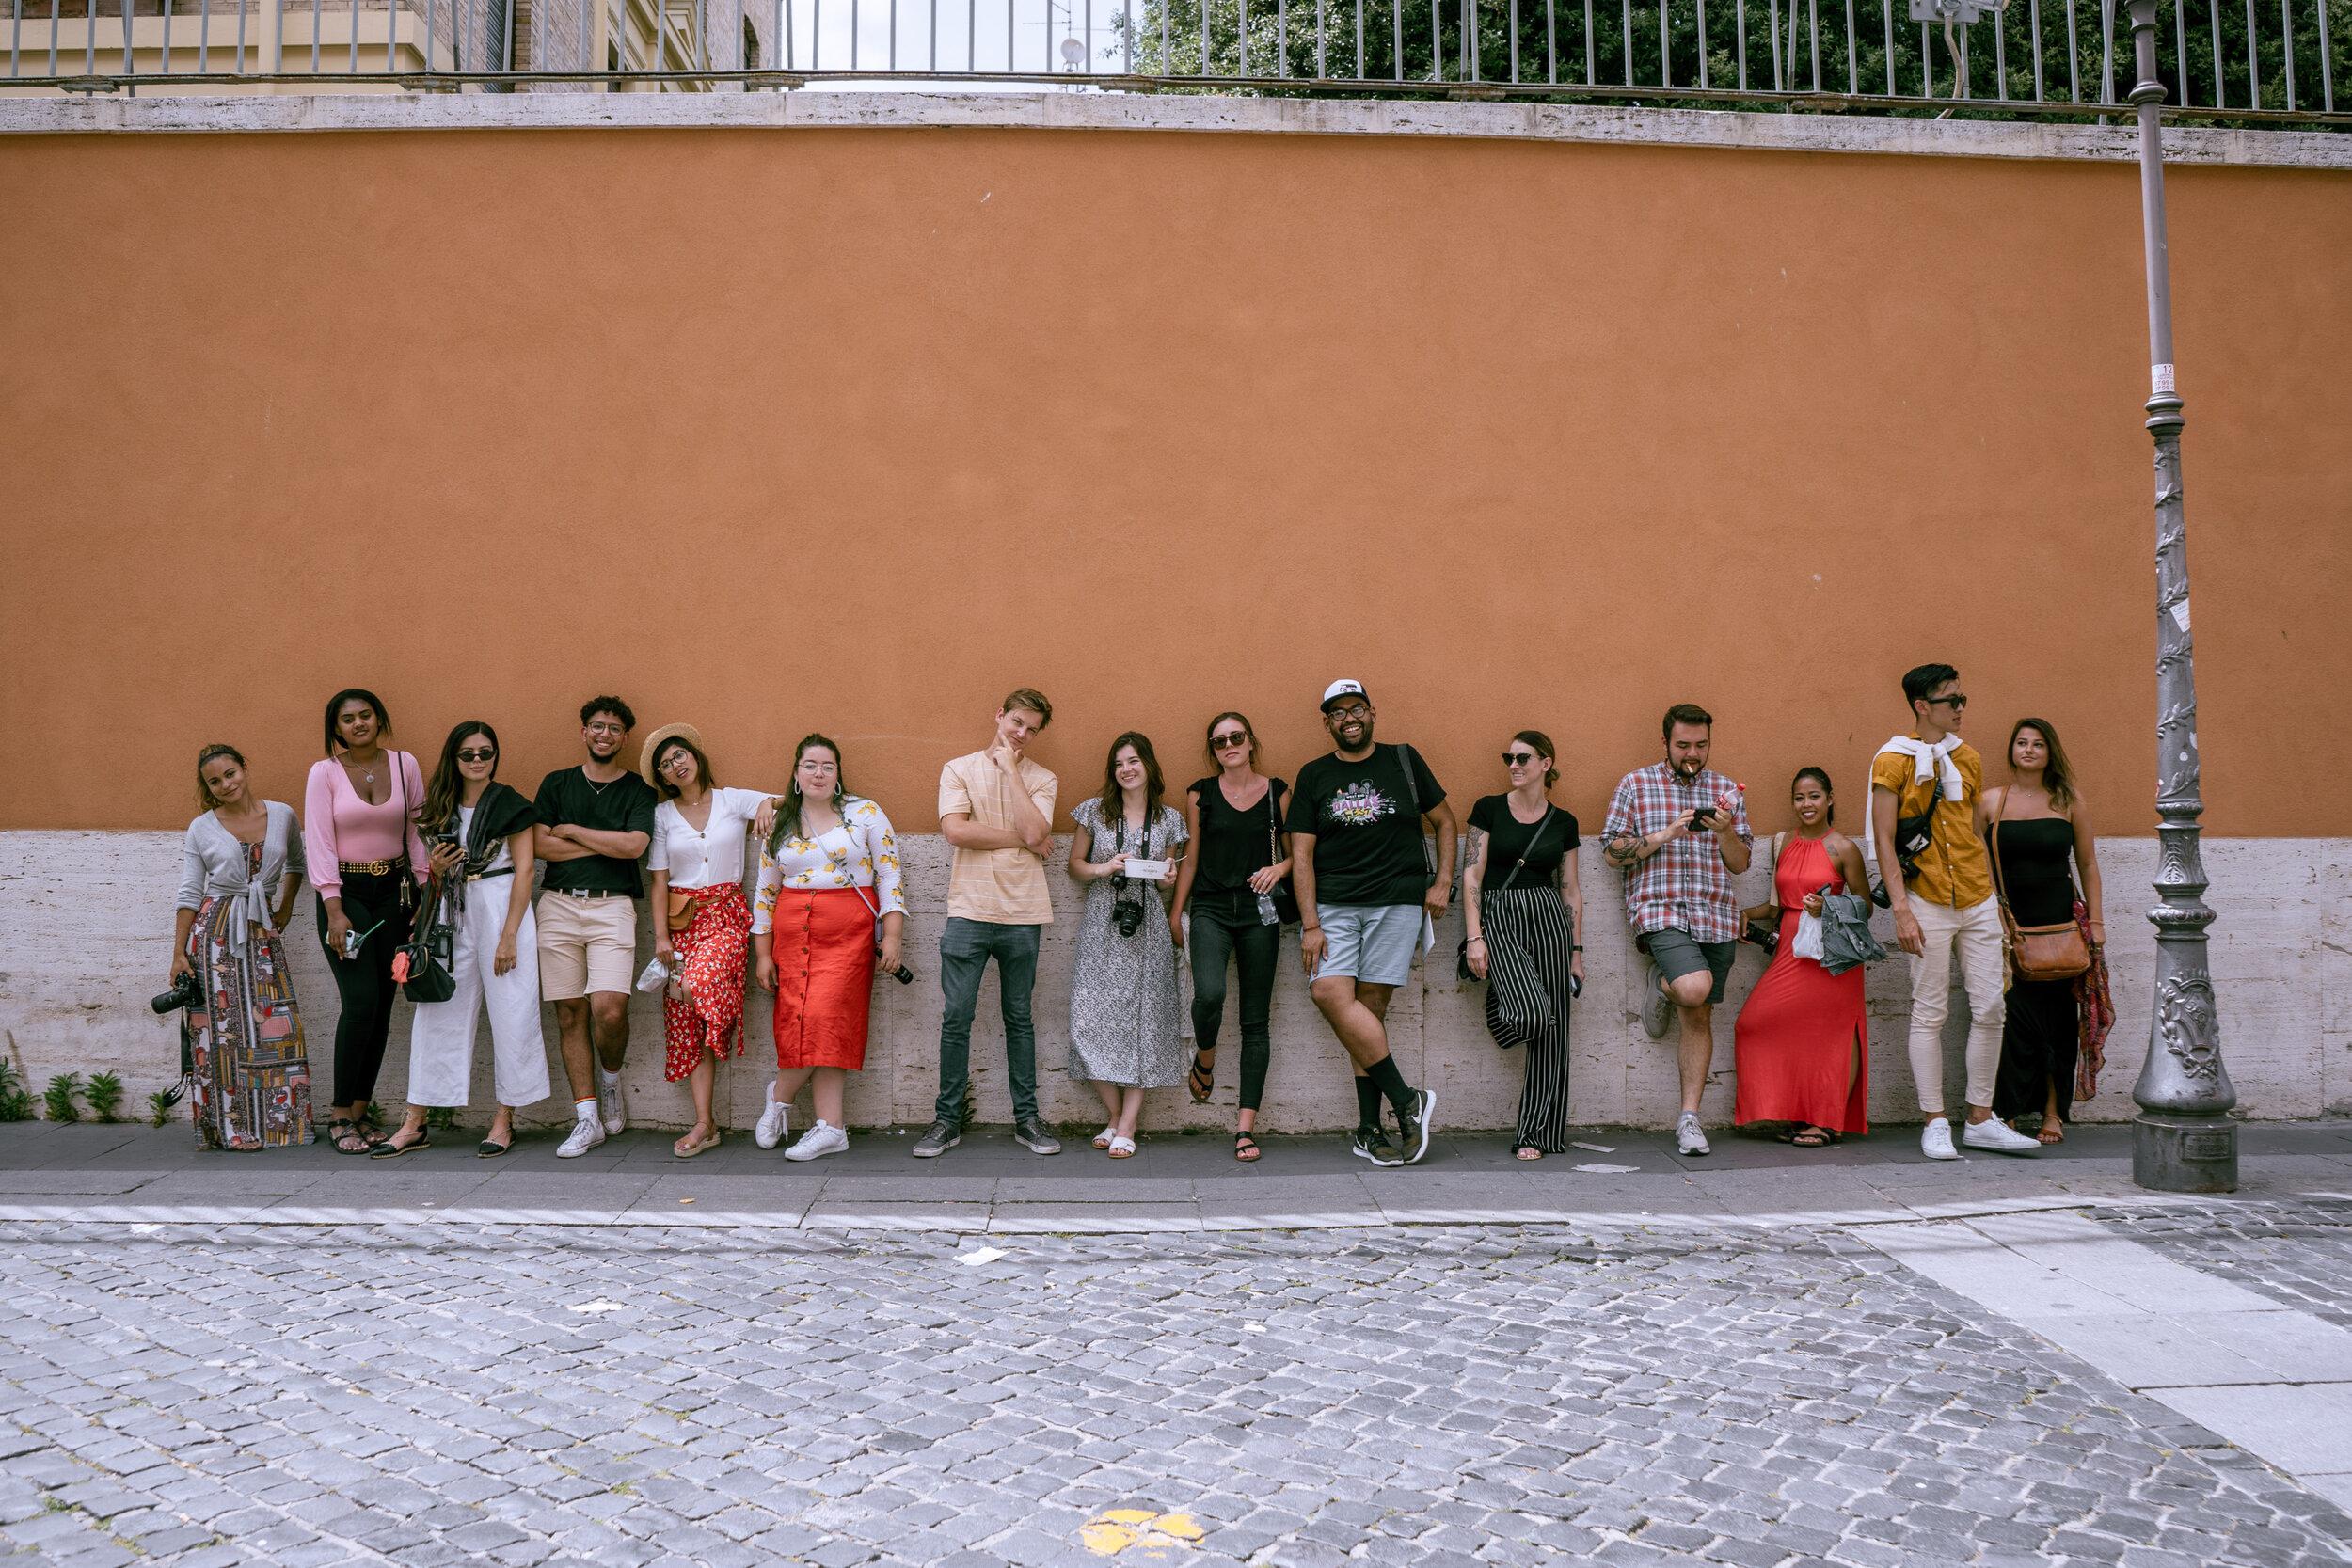 Rachel Off Duty: Traveling Group in Europe